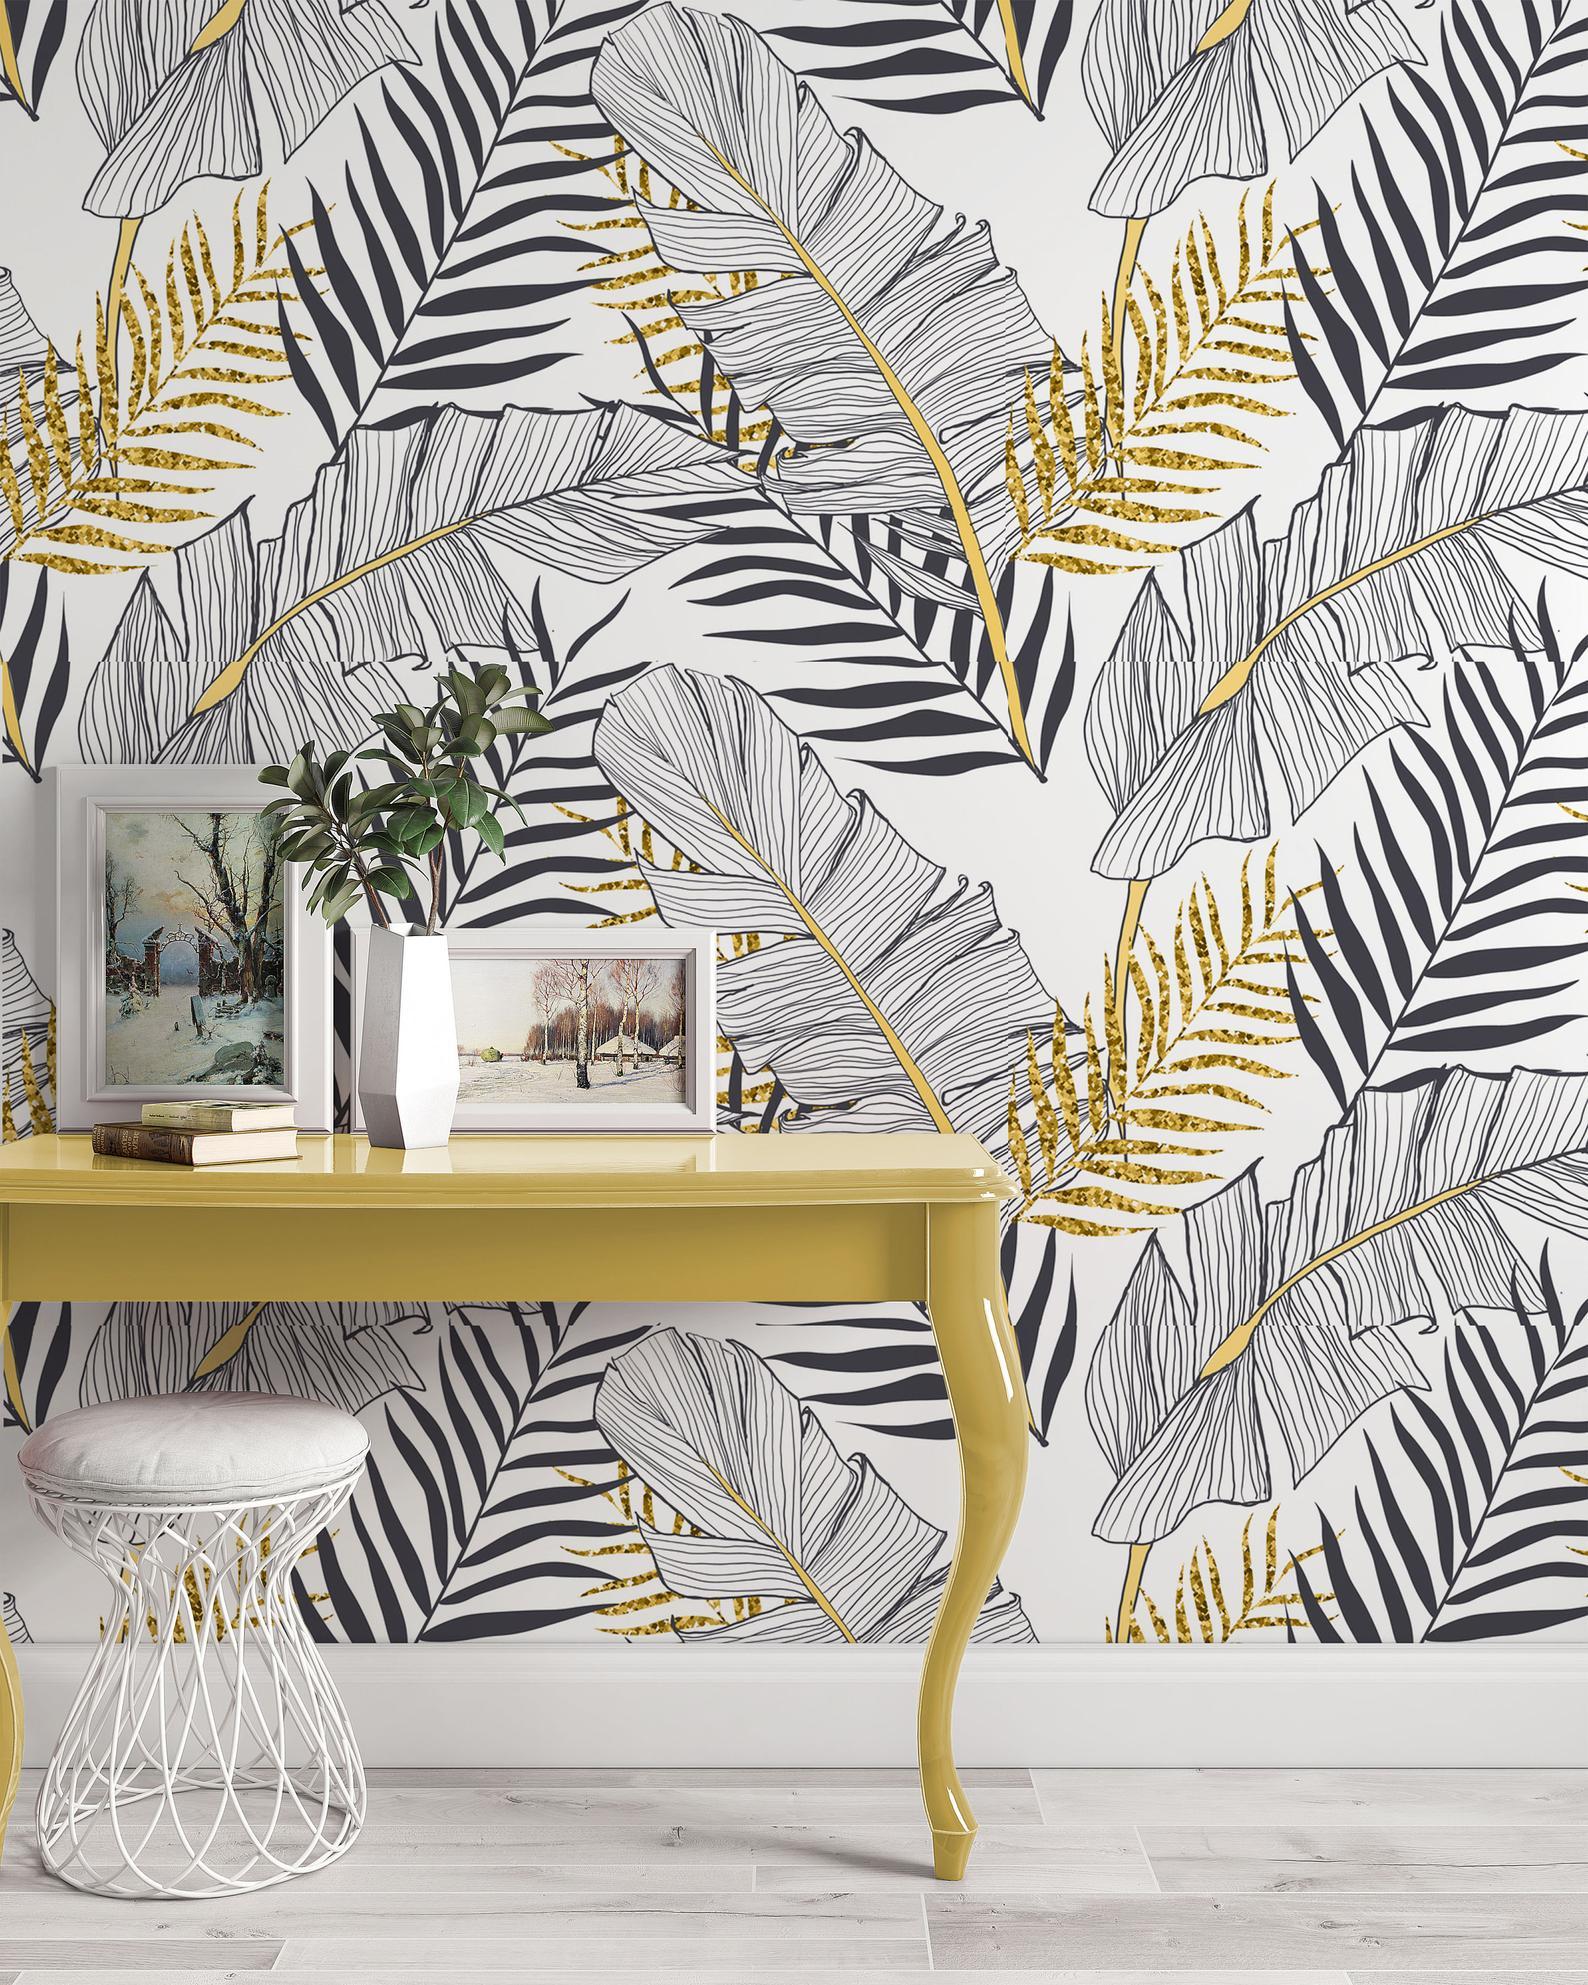 WallpaewBlack White Gold Look Exotic Tropical Leaves Wallpaper, black white and gold wallpaper, palm leaf wallpaper, neutral wallpaper, statement wallpapers, gold wallpaper, entryway wallpaper, entryway wallpaper ideas